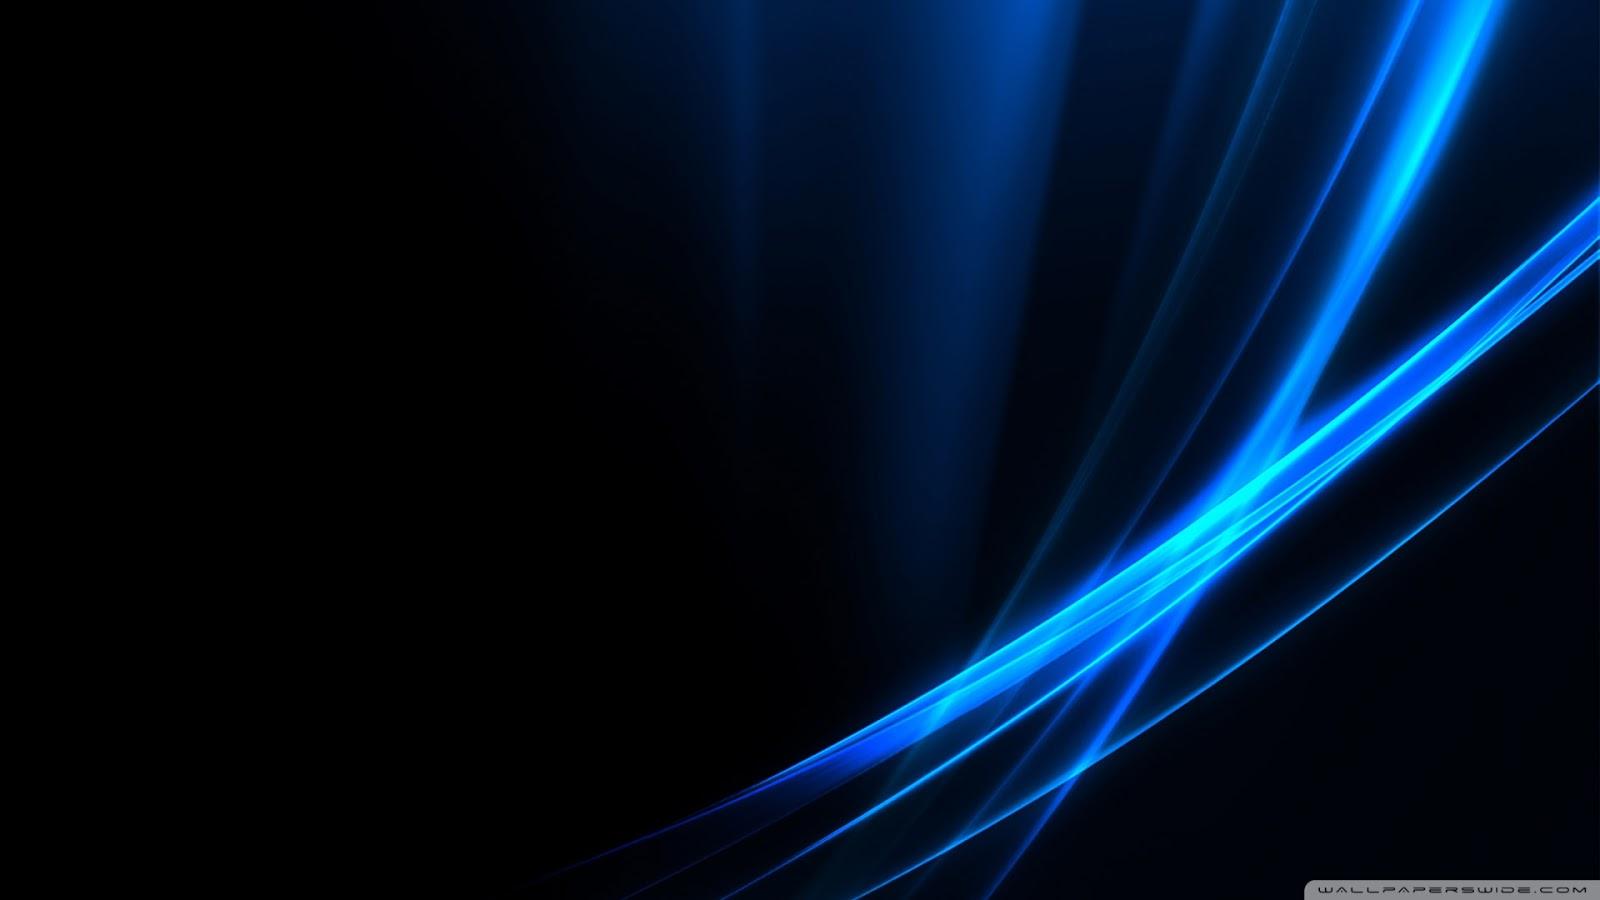 Black And Blue Cool 3d Wallpapers: 美しい窓のデスクトップの壁紙10 1920x1080の